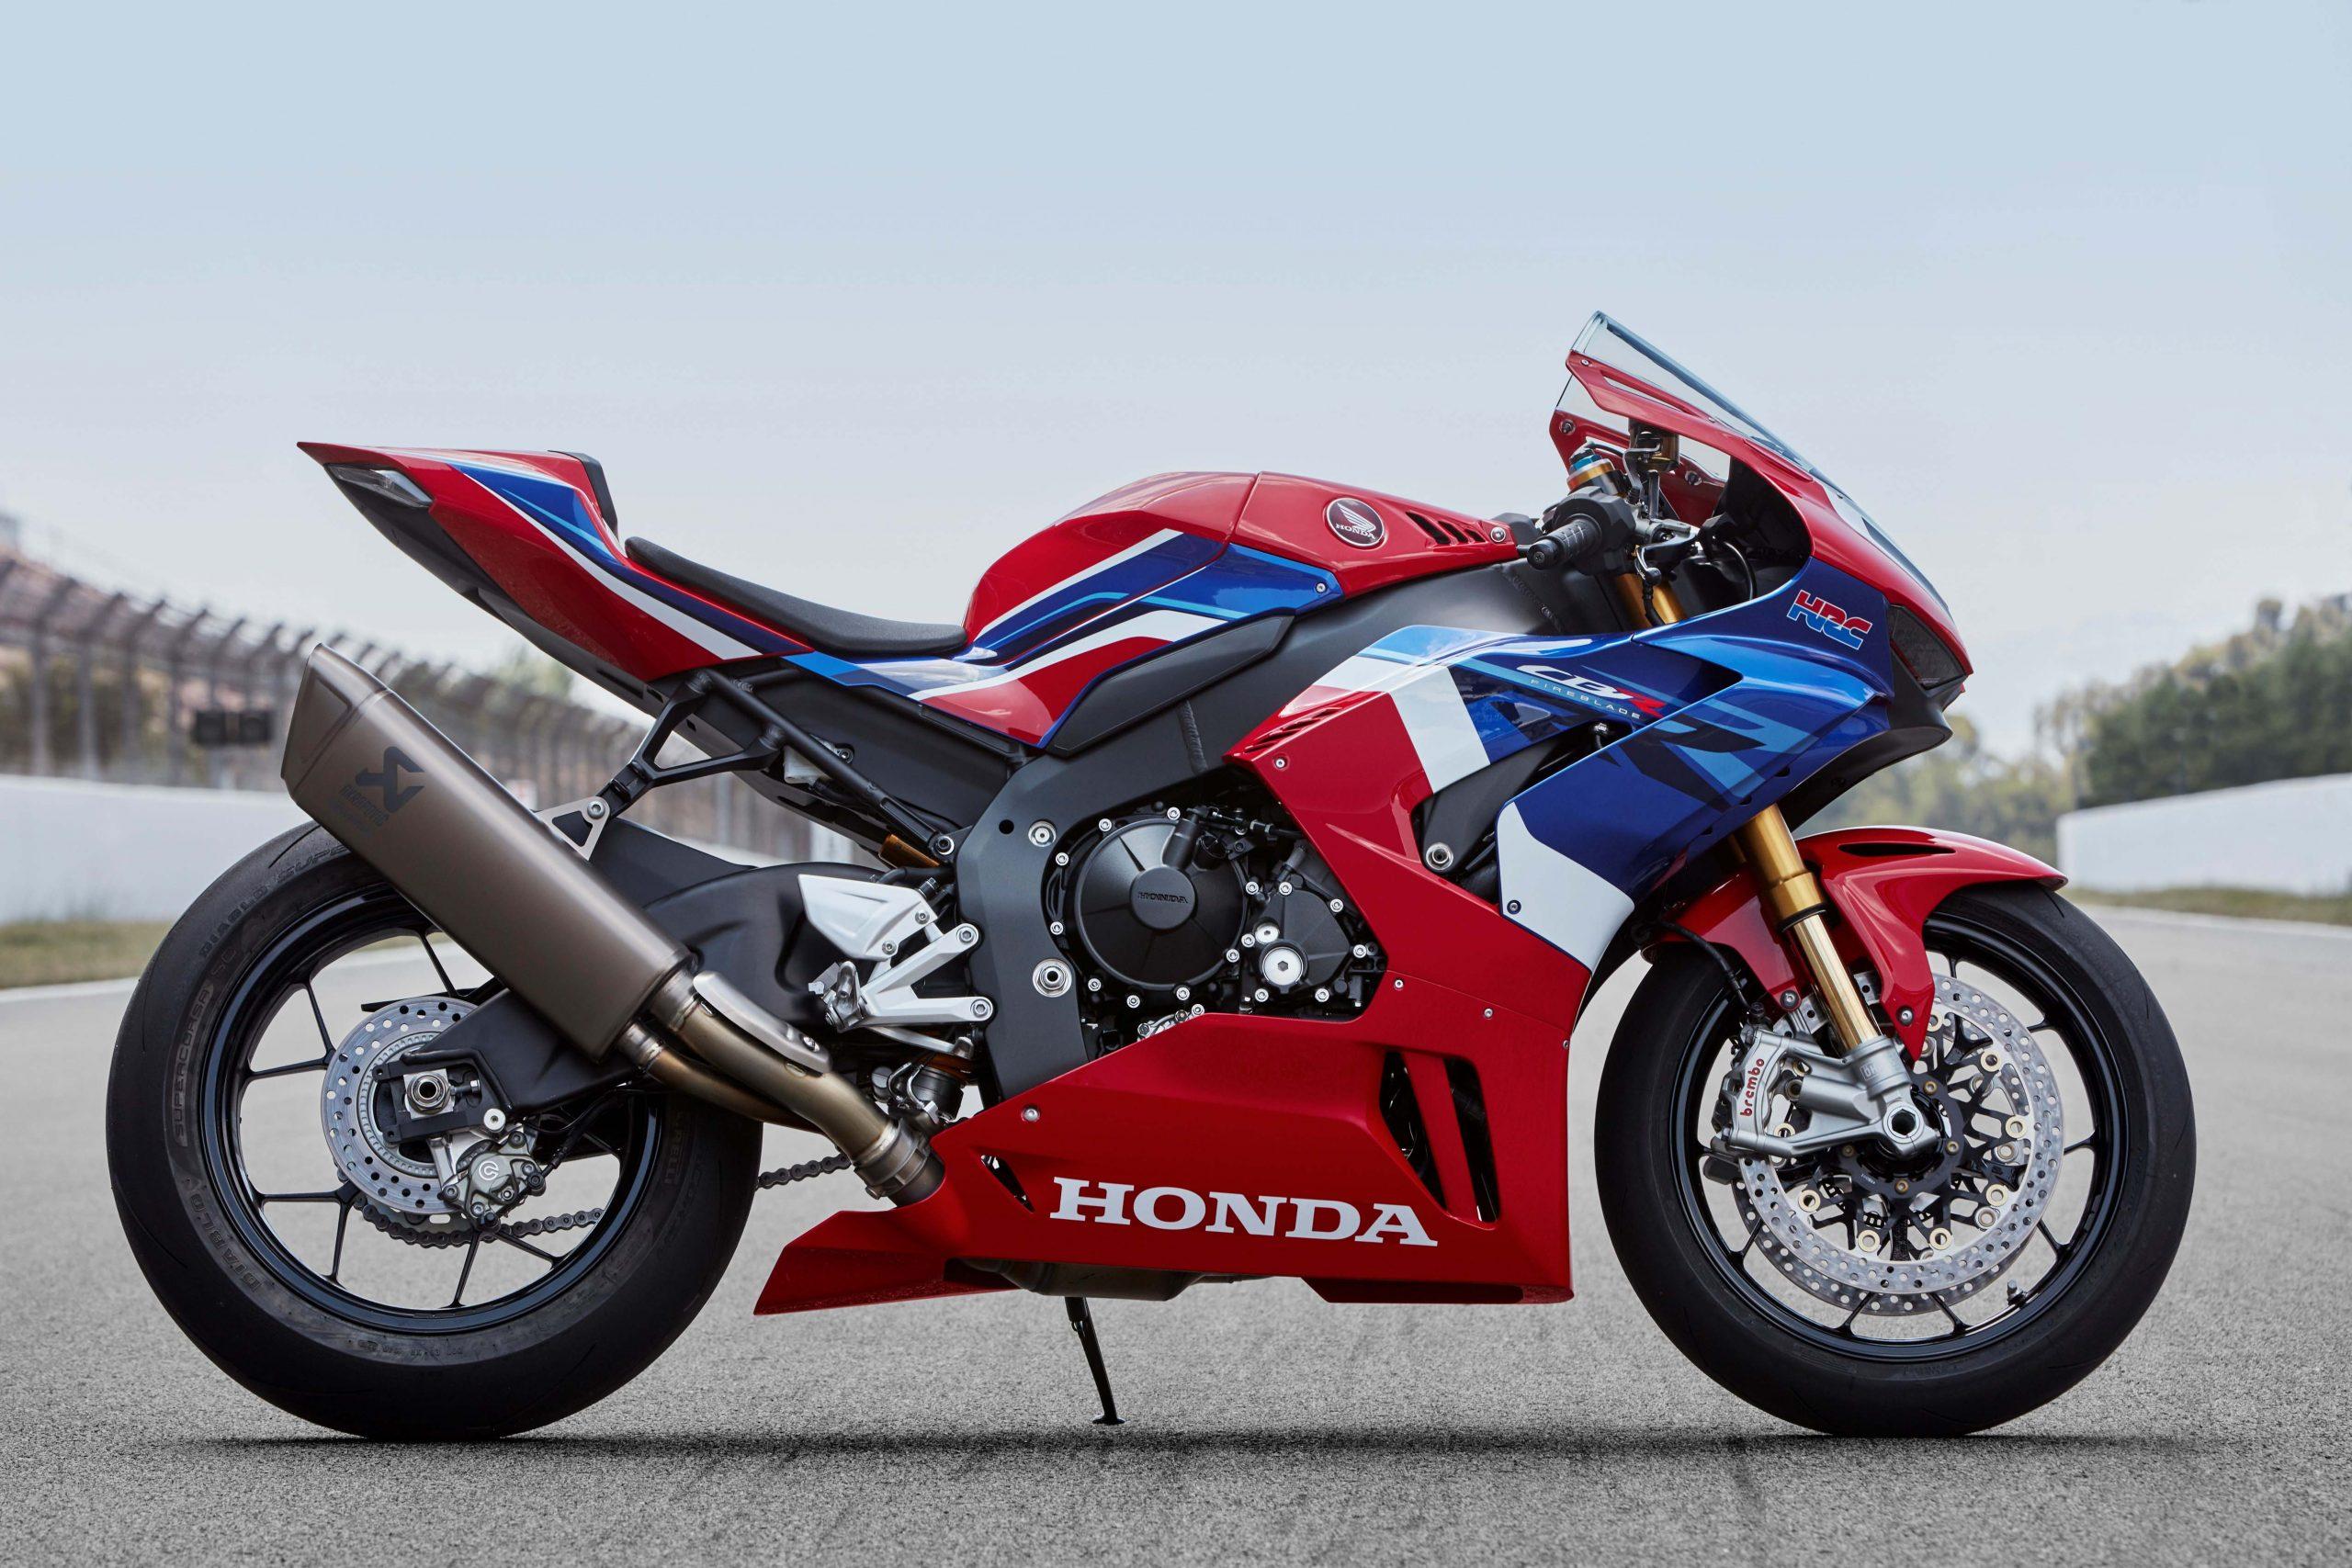 Are Honda secretly working on a new V4 superbike? 3